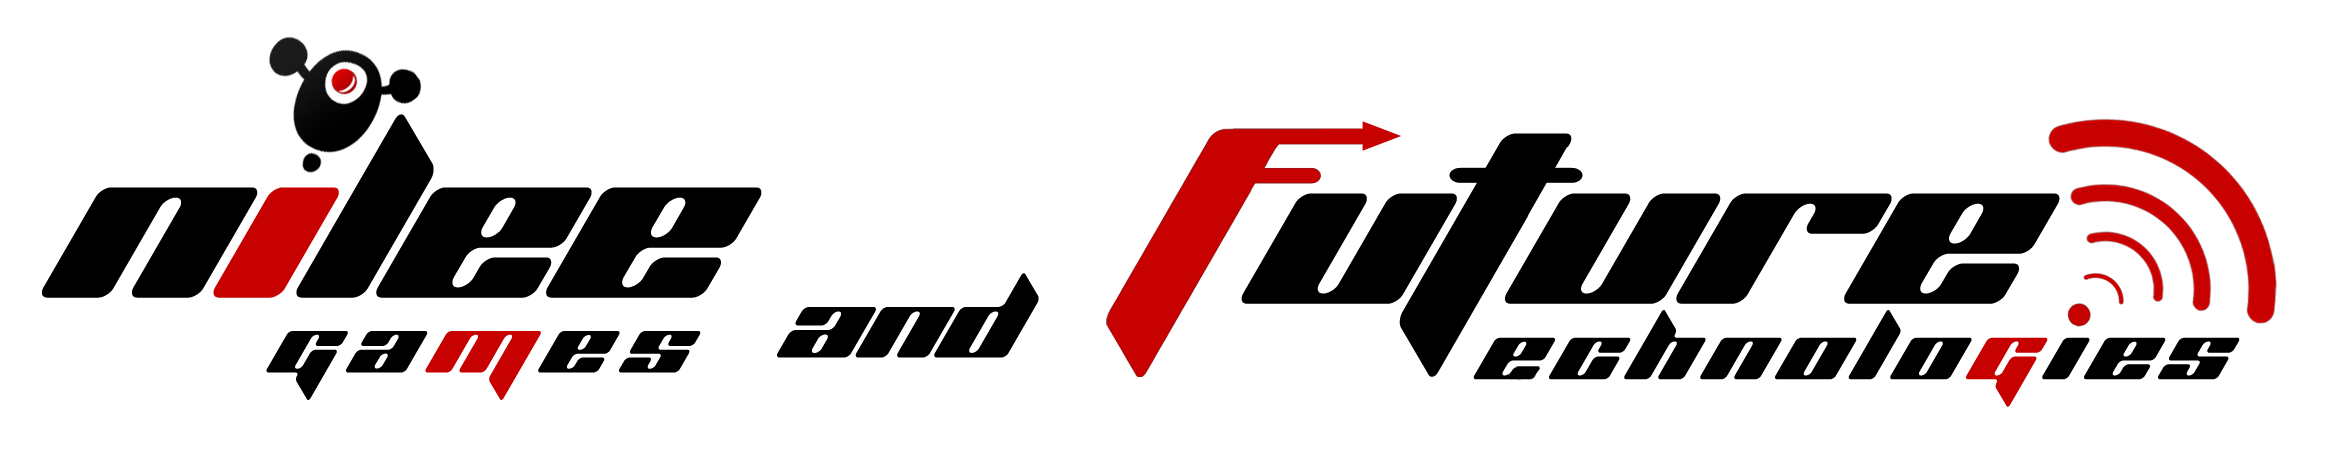 Nilee Games and Future Technologies Pvt. Ltd - Mobile Marketing company logo